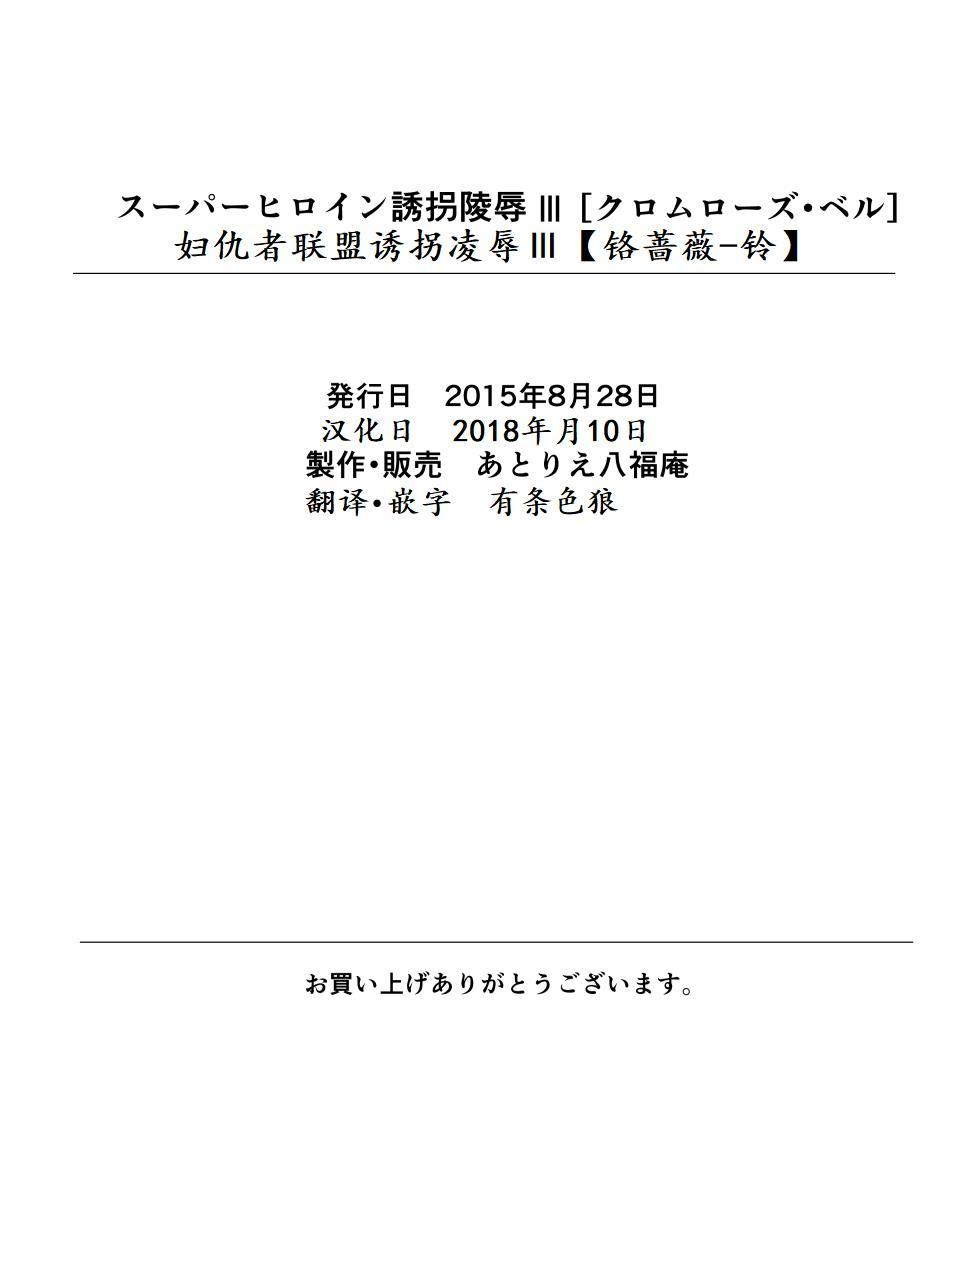 [Atelier Hachifukuan] Superheroine Yuukai Ryoujoku III - Superheroine in Distress [Chrome Rose Bell]   凌辱诱拐3 [Chinese] [有条色狼汉化] 37